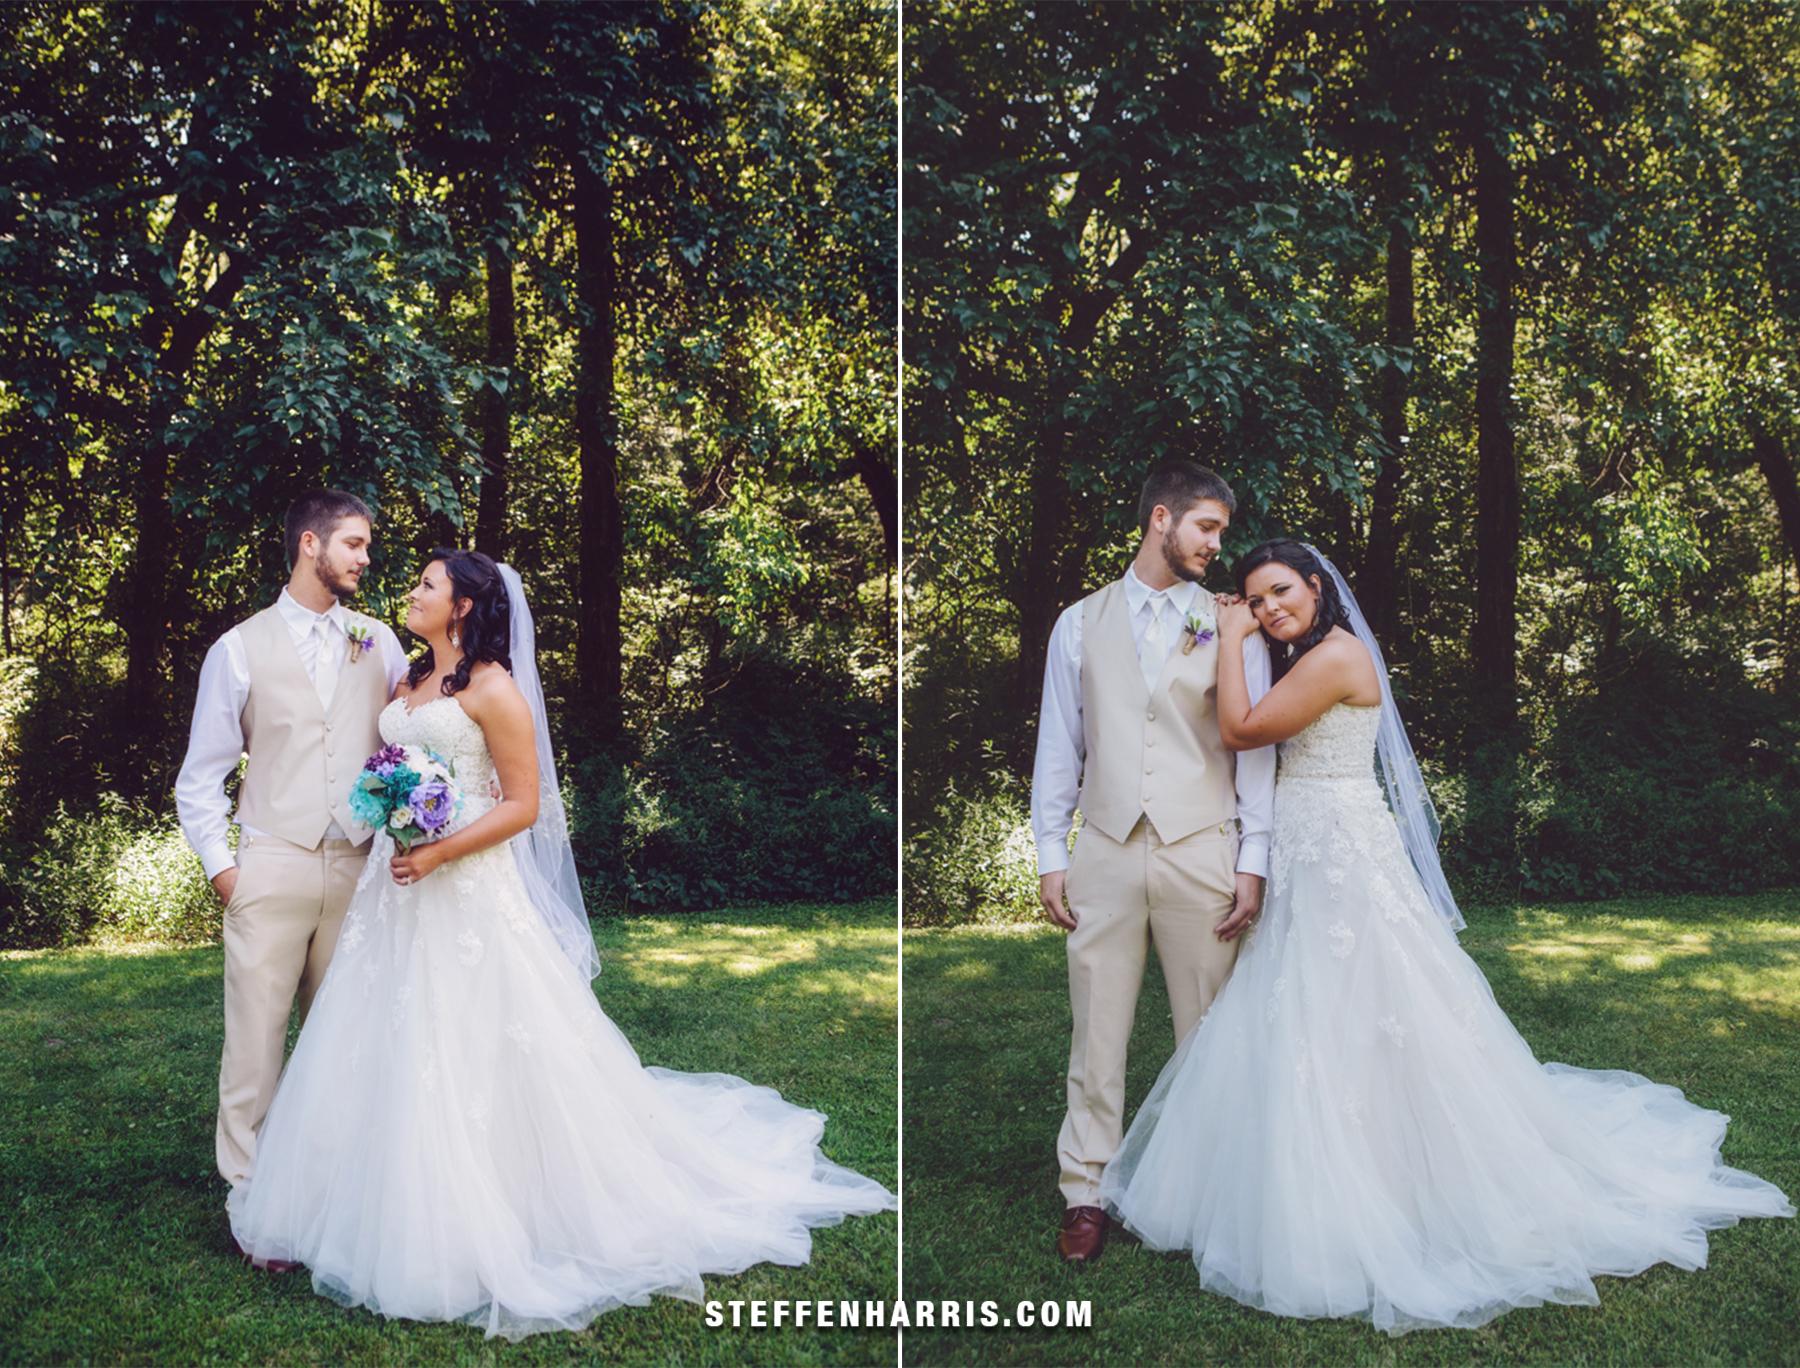 casey-aaron-salem-il-wedding-photography-44